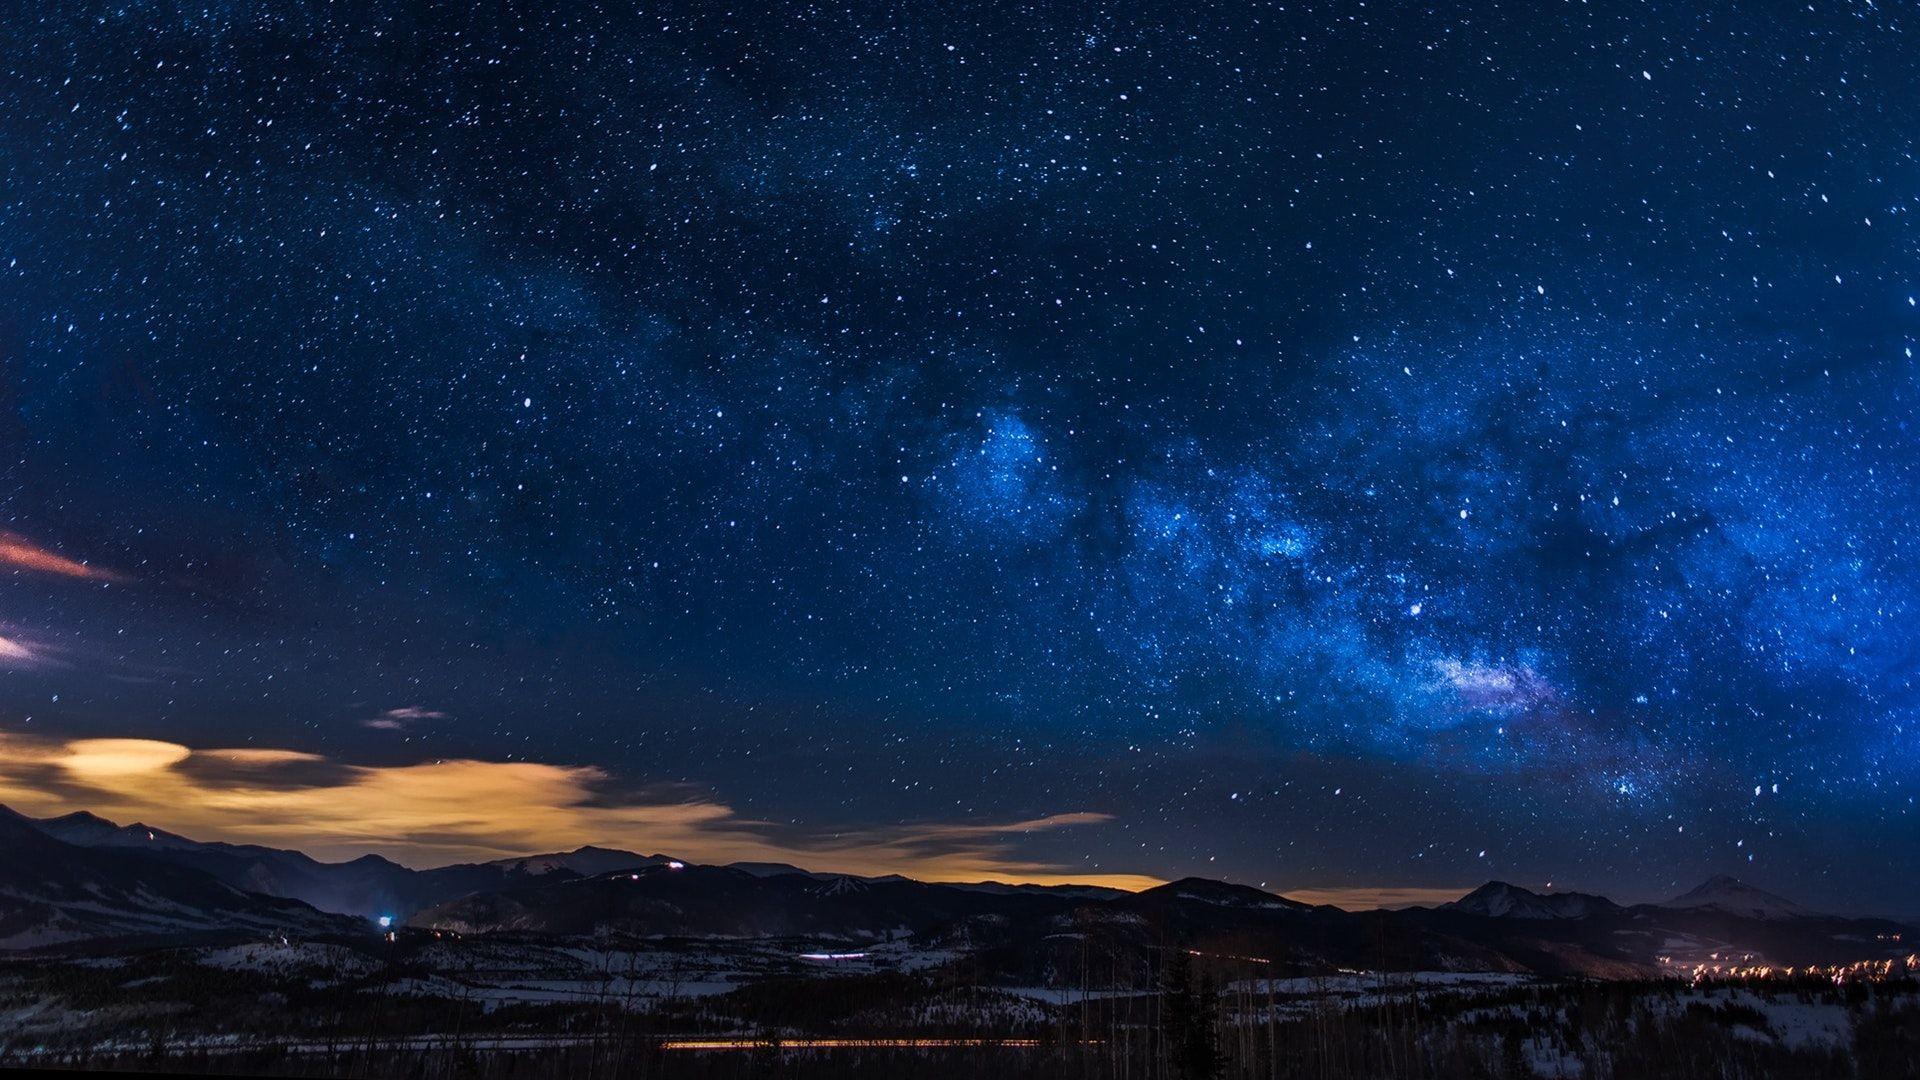 Black Mountains Under The Stars At Nighttime 1920x1080 Computer Wallpaper Desktop Wallpapers Night Sky Wallpaper Computer Wallpaper